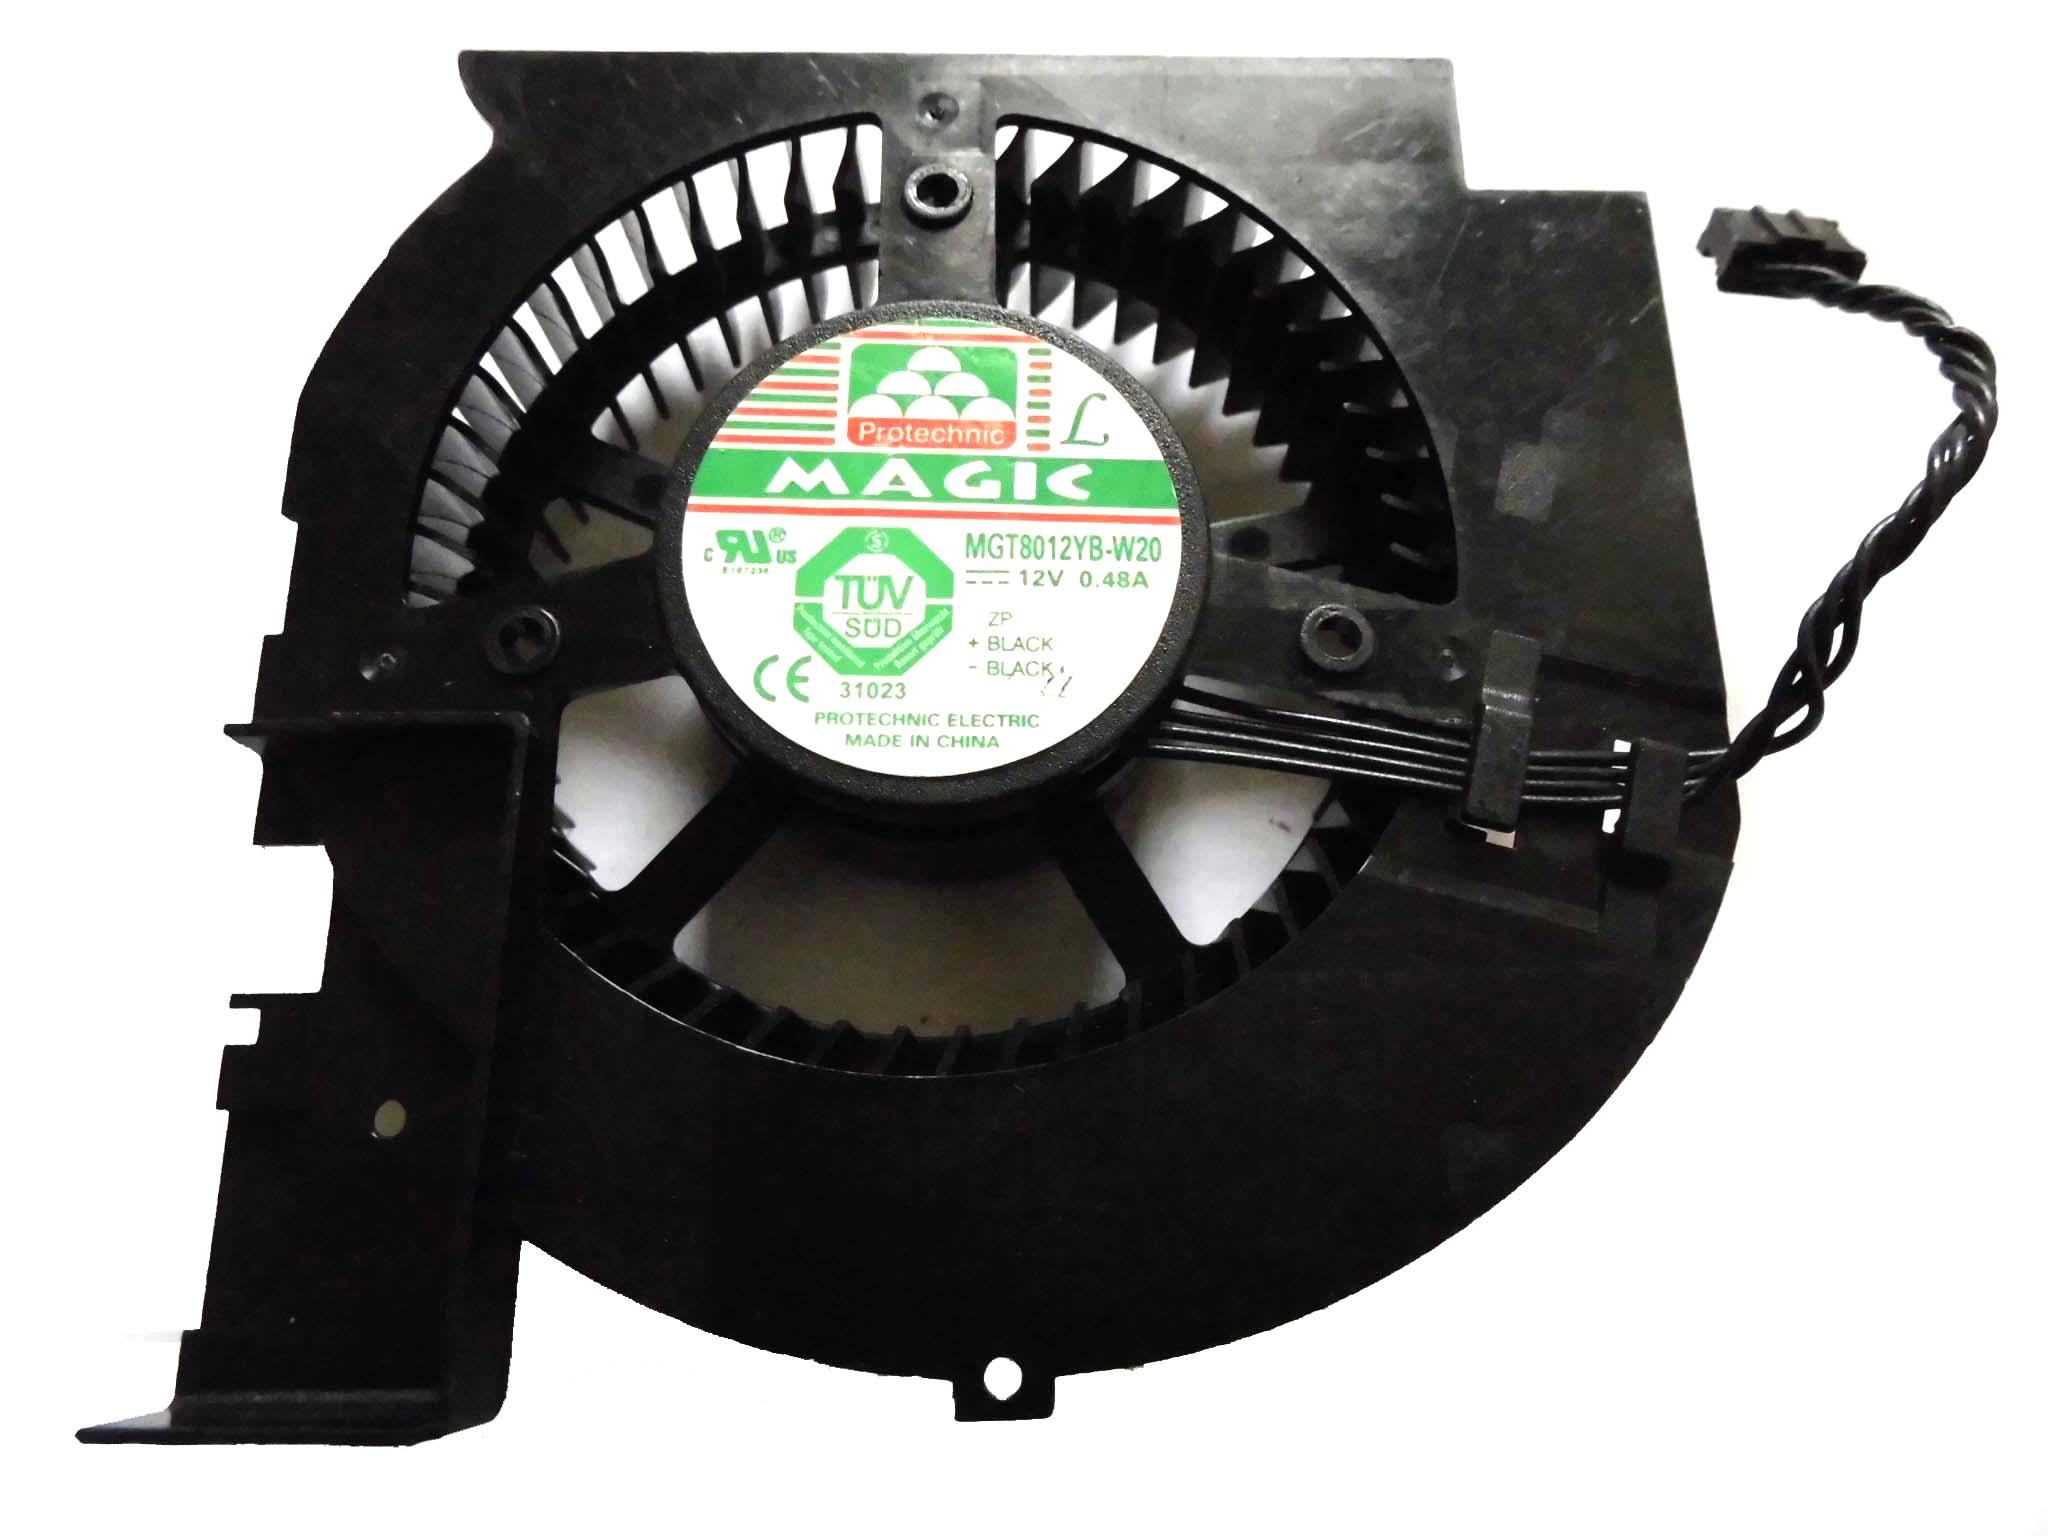 프레임 MAGIC 8025 MGT8012YB-W20 냉각 팬 12V 0.48A 4 선식